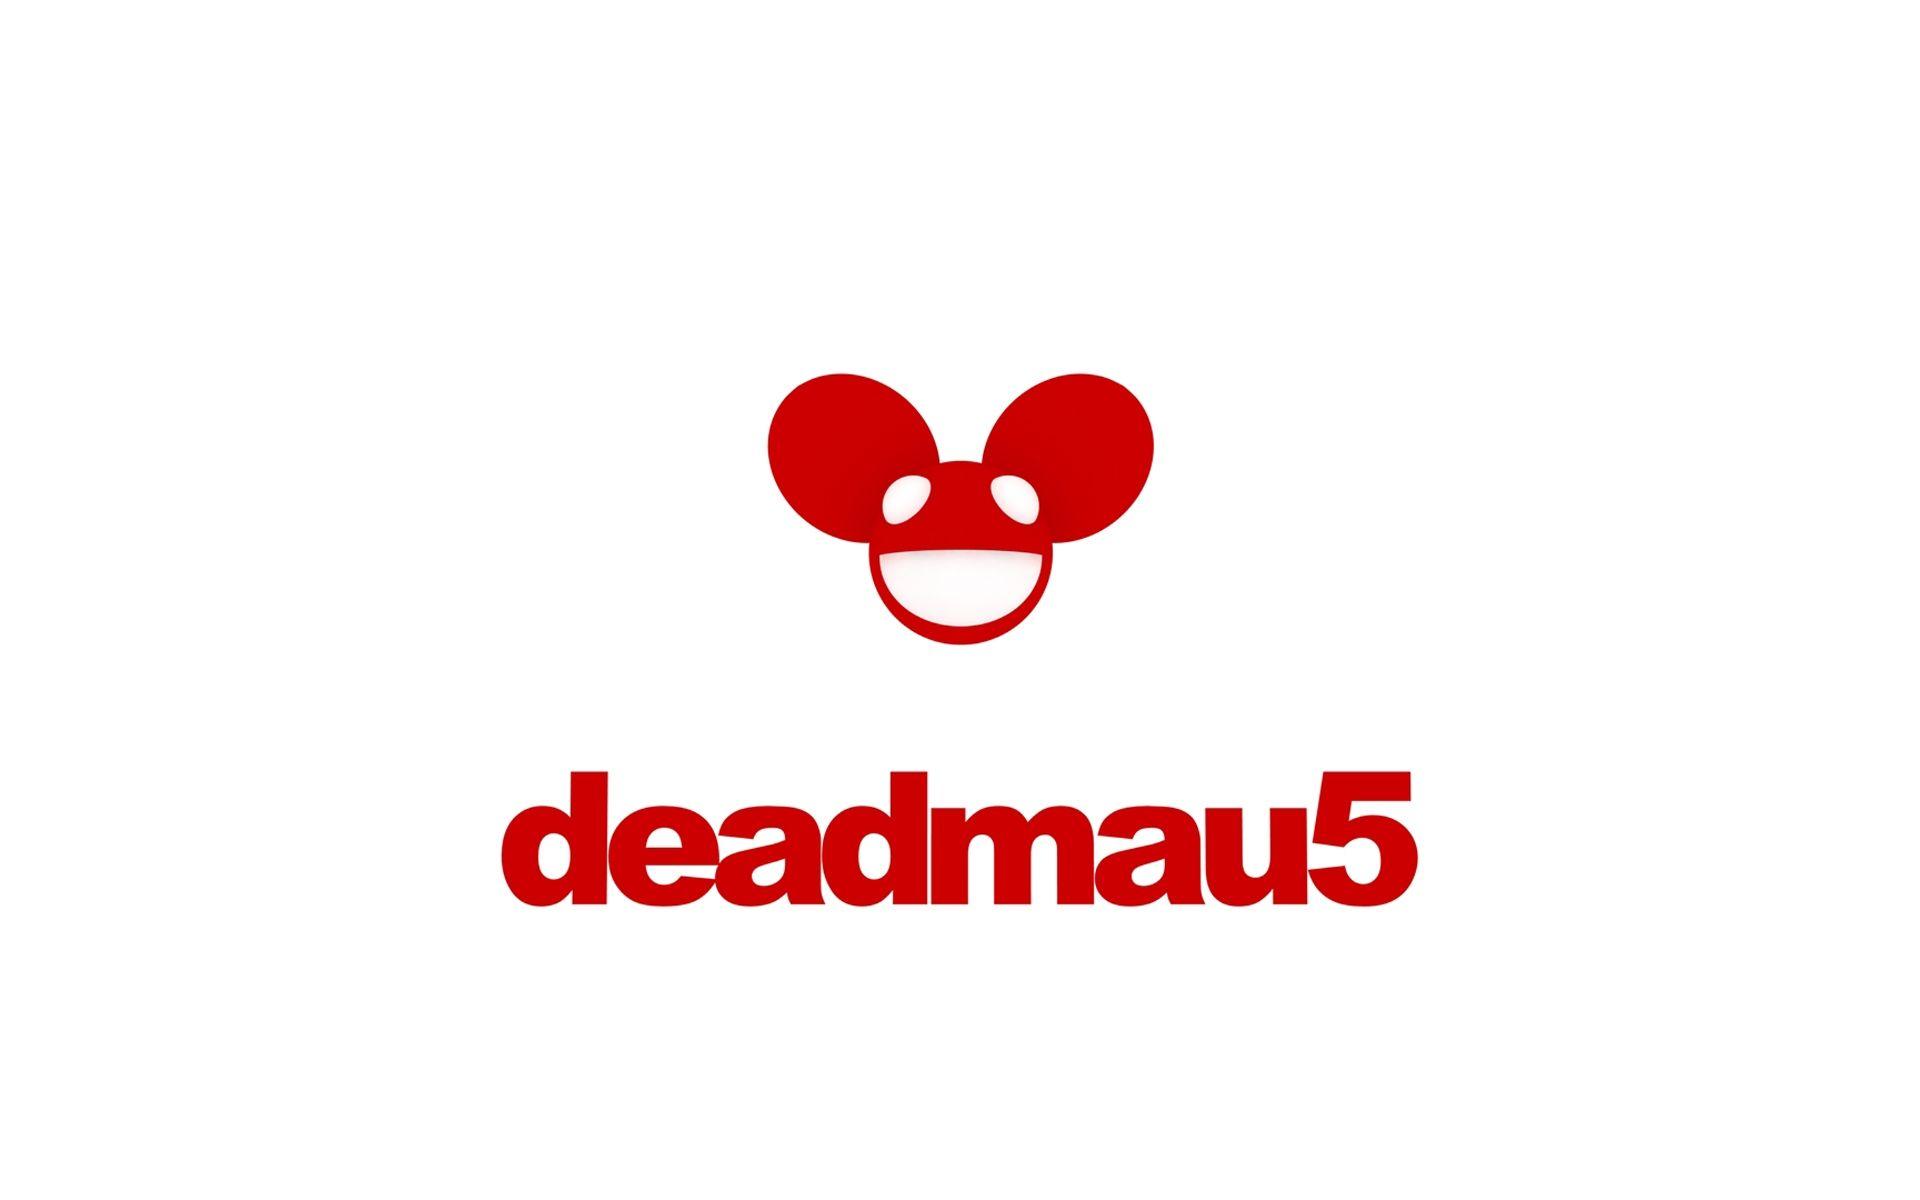 deadmau5 logo 28344